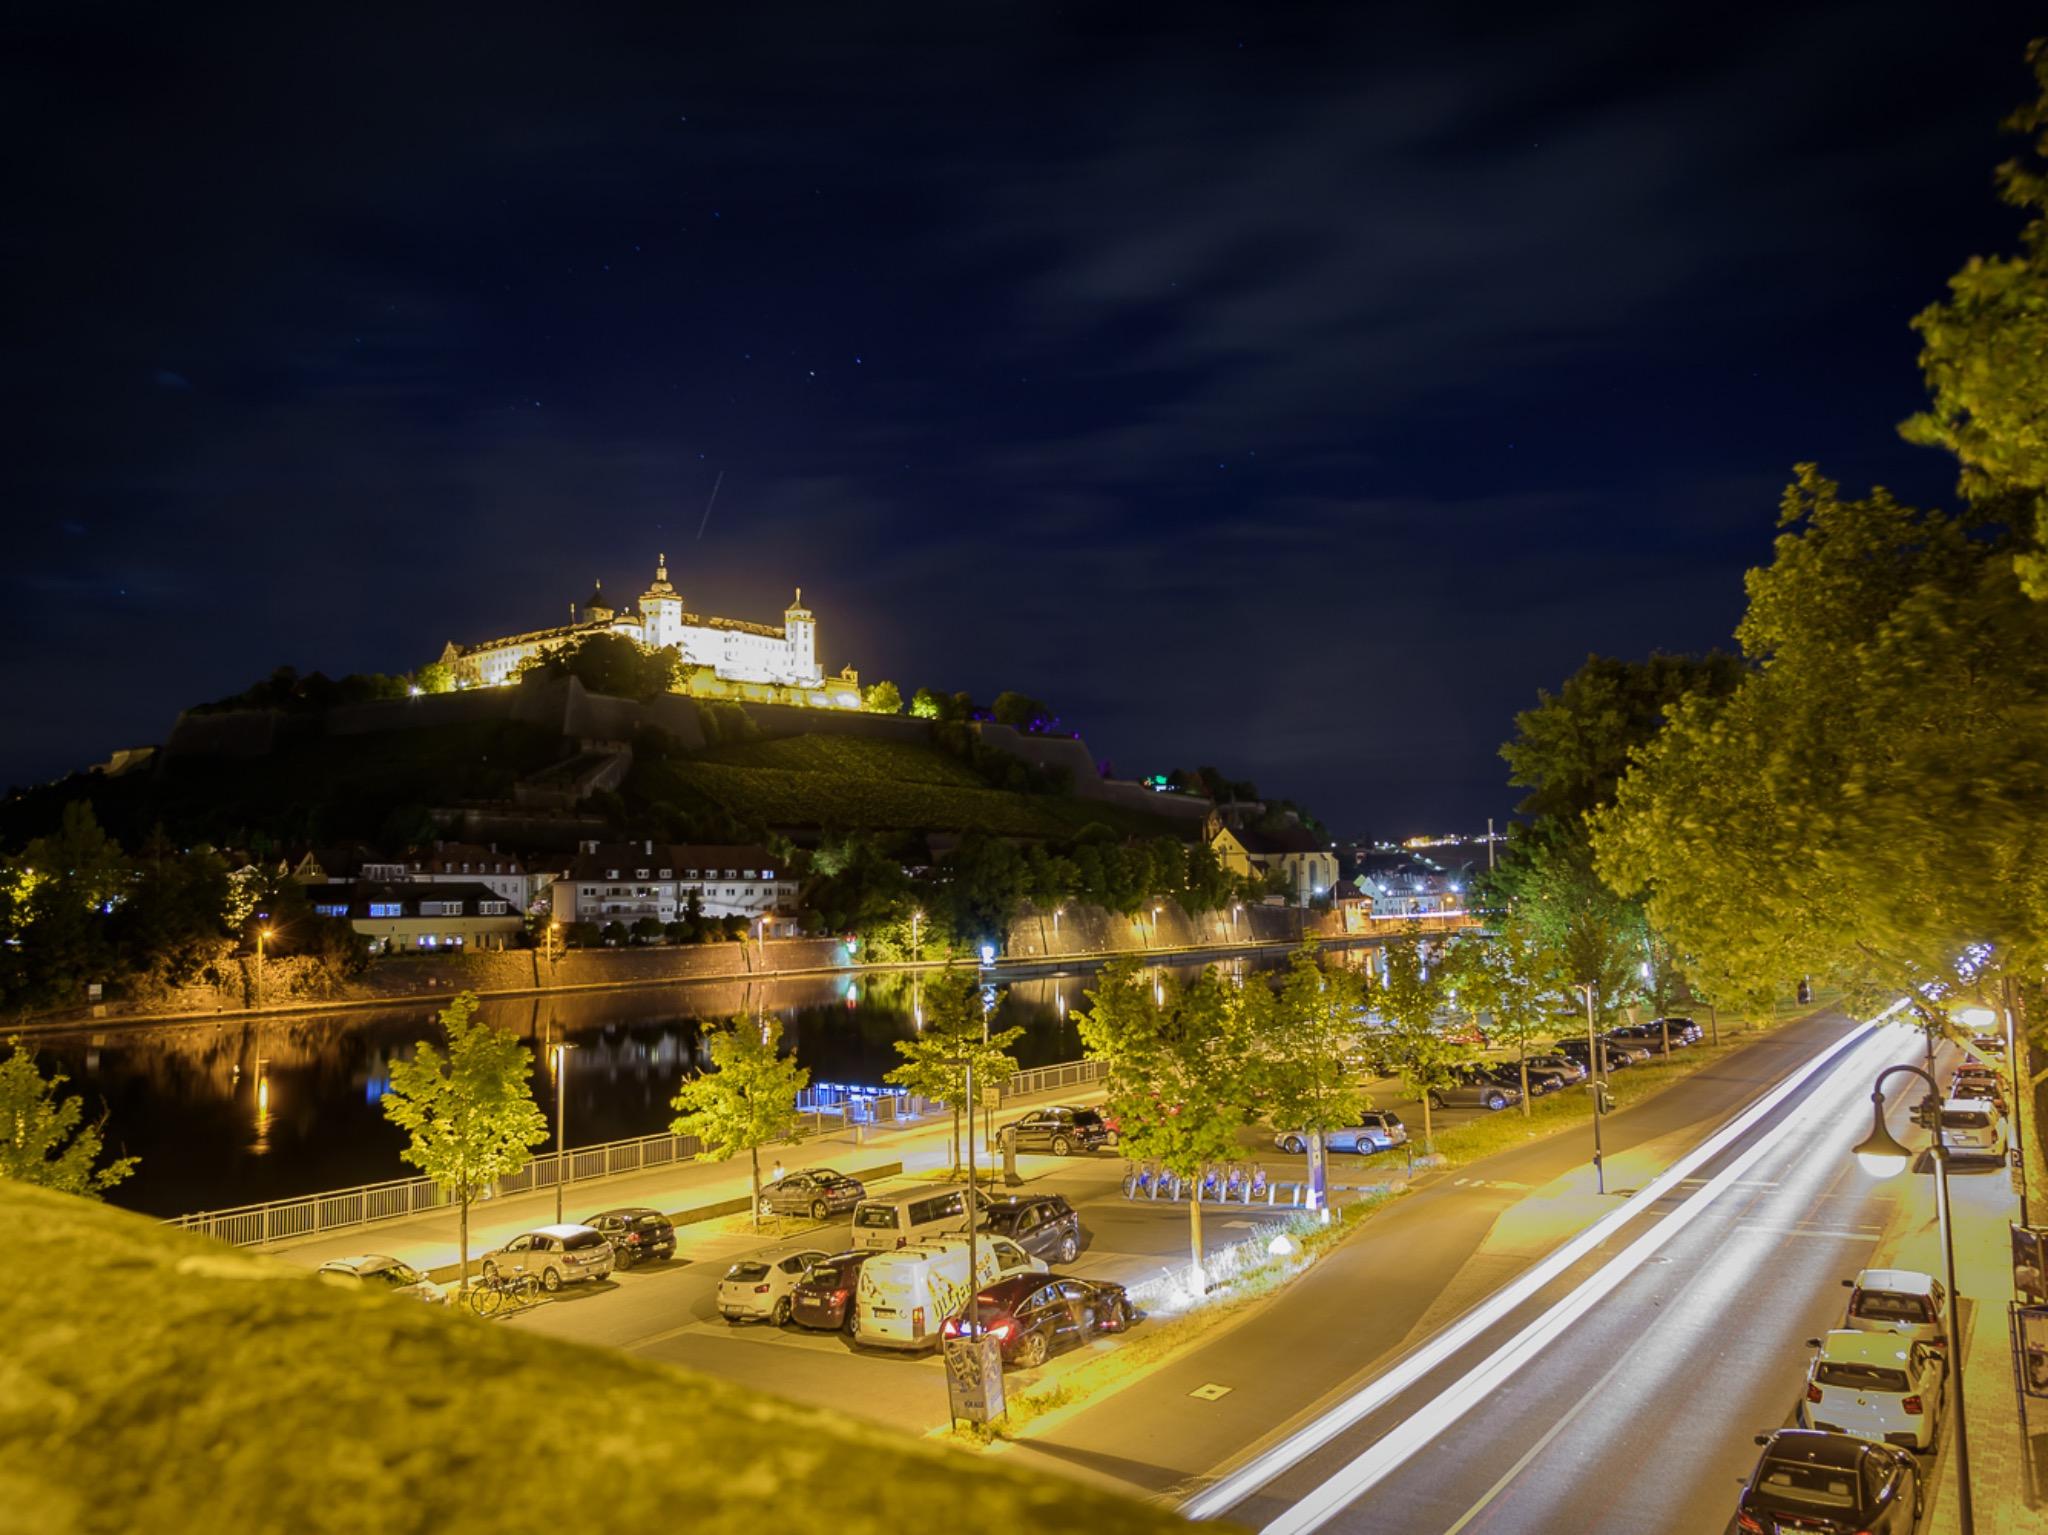 Die Festung Marienberg bei Nacht. Foto: Pascal Höfig